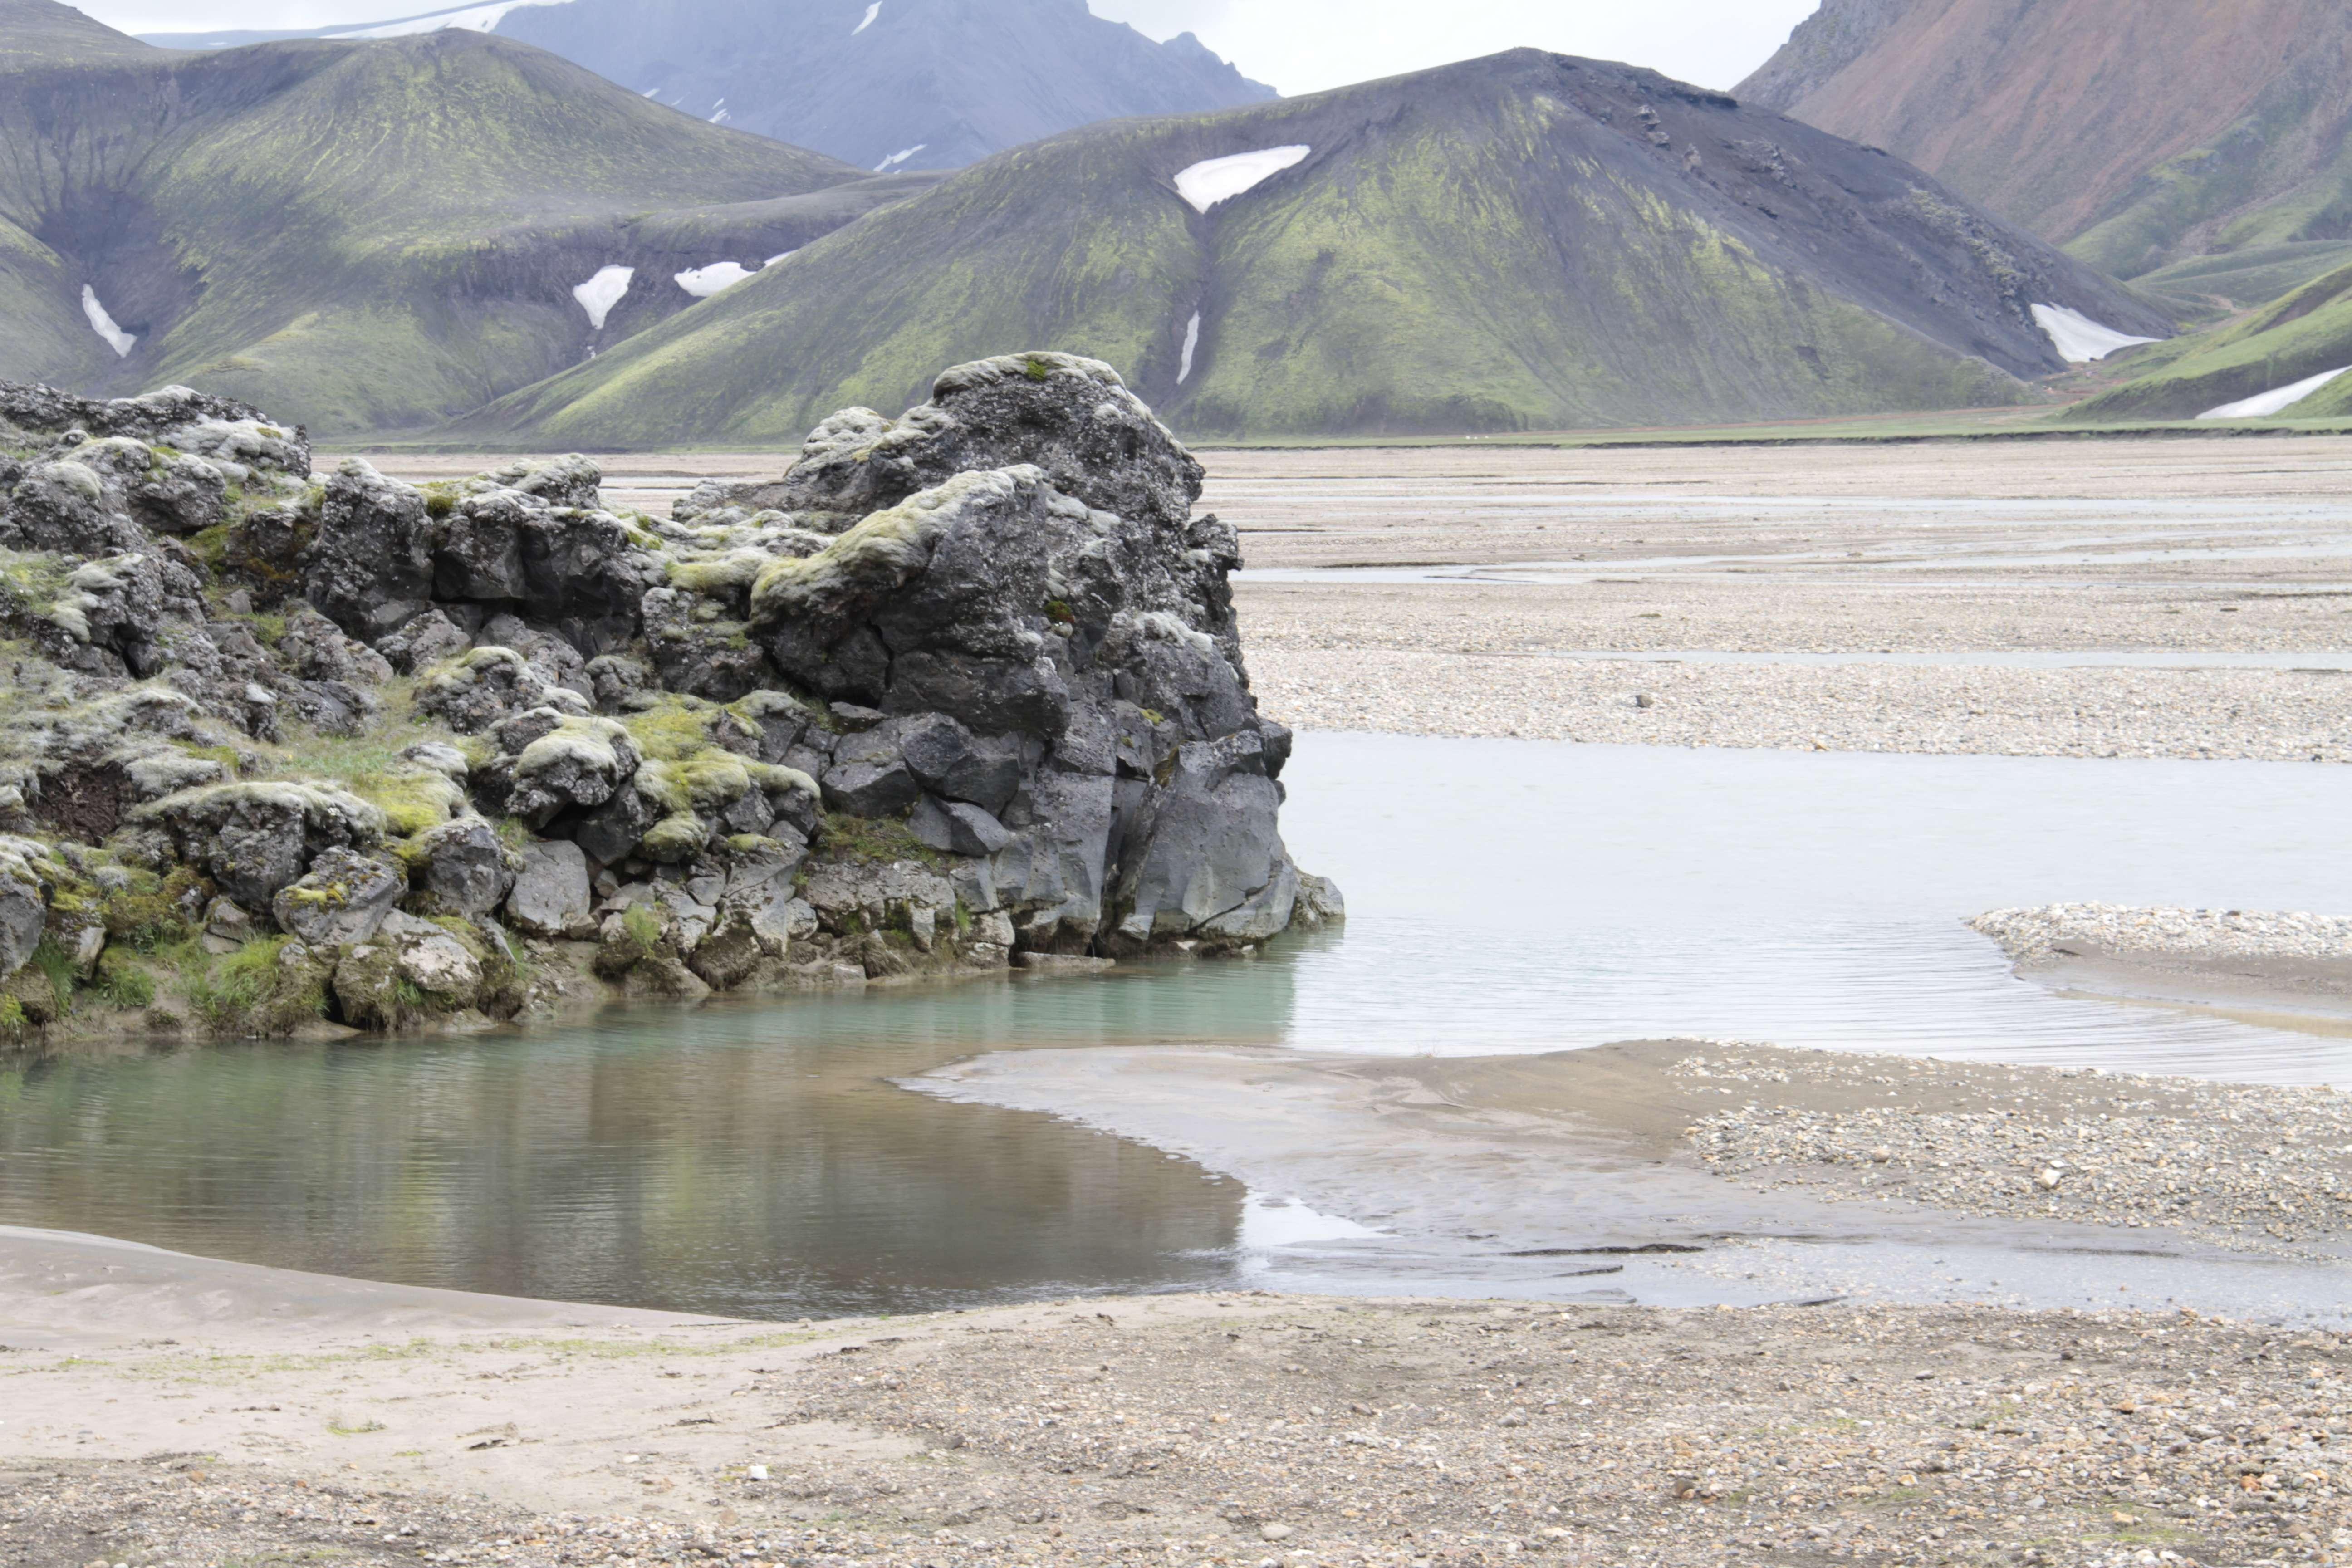 Islande_0506 rando Landmanalaugar 16 juillet